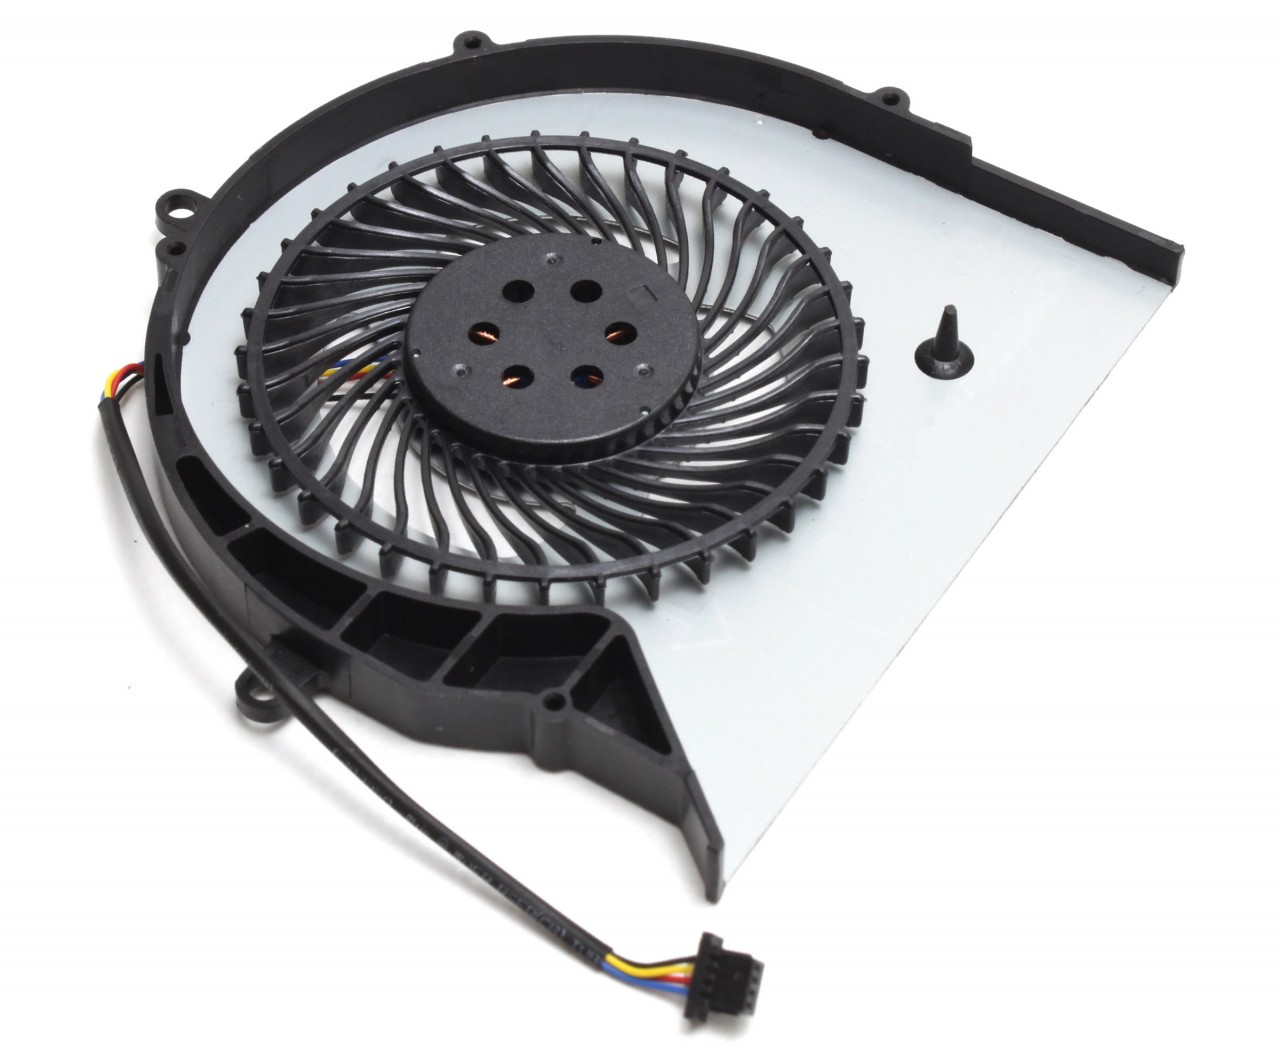 Cooler procesor CPU laptop Asus FX63VM imagine powerlaptop.ro 2021